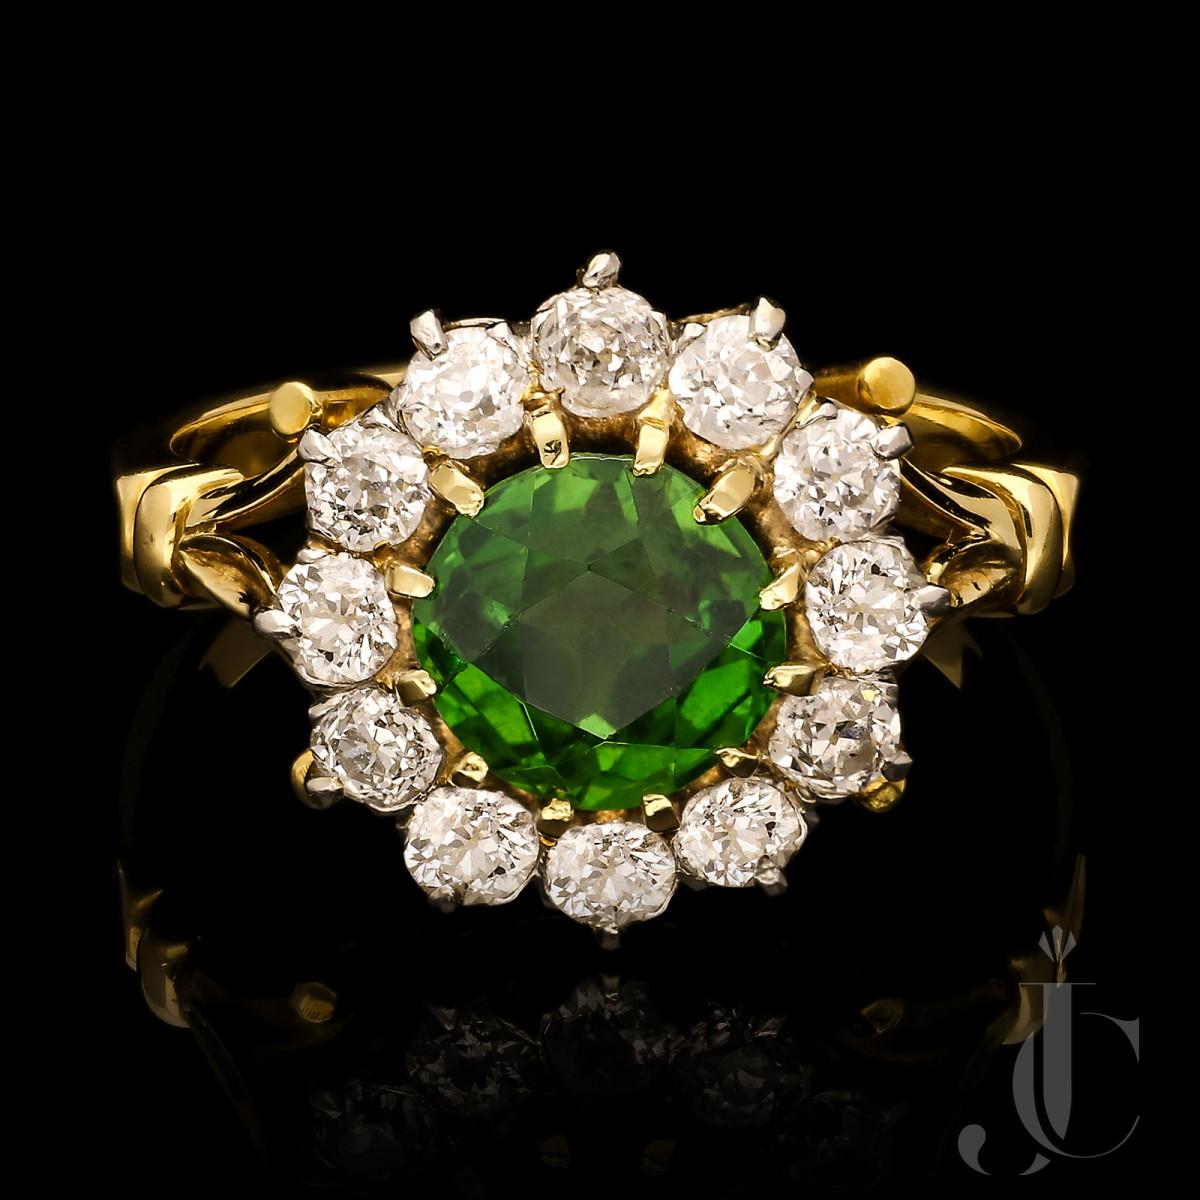 2.08ct Demantoid Garnet & diamond cluster ring